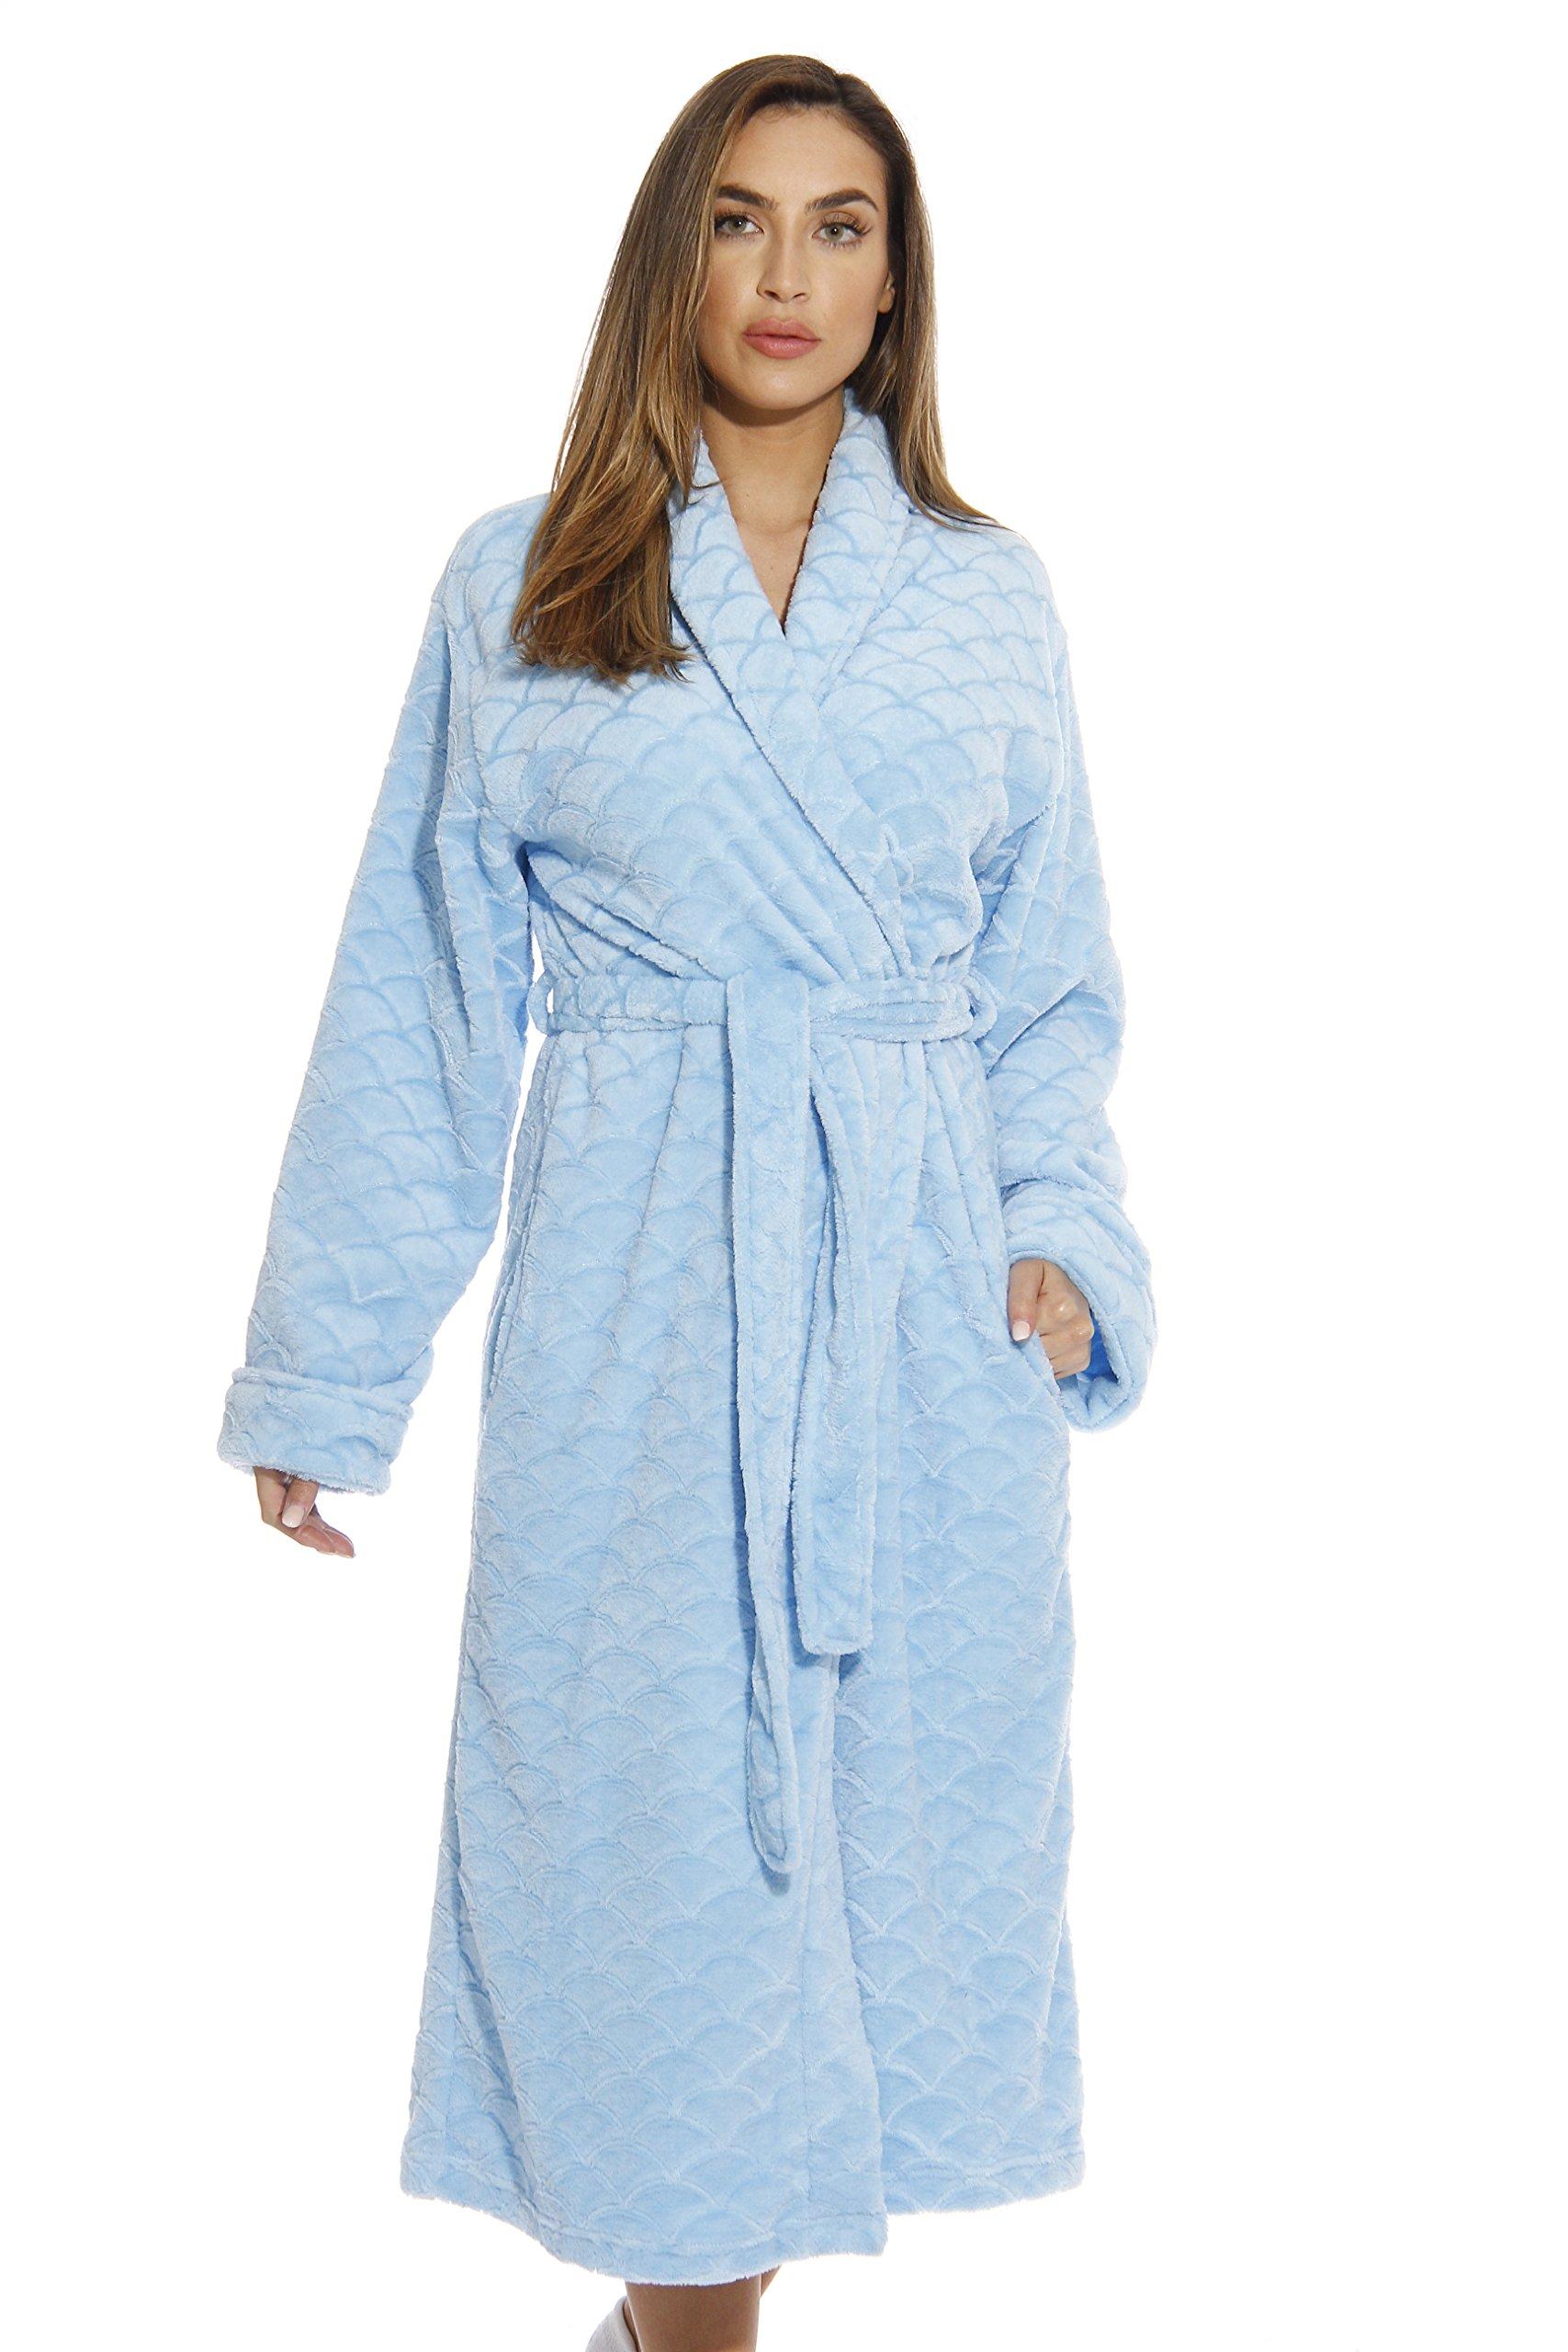 6340-Lt Blue-3X Just Love Kimono Robe / Bath Robes for Women